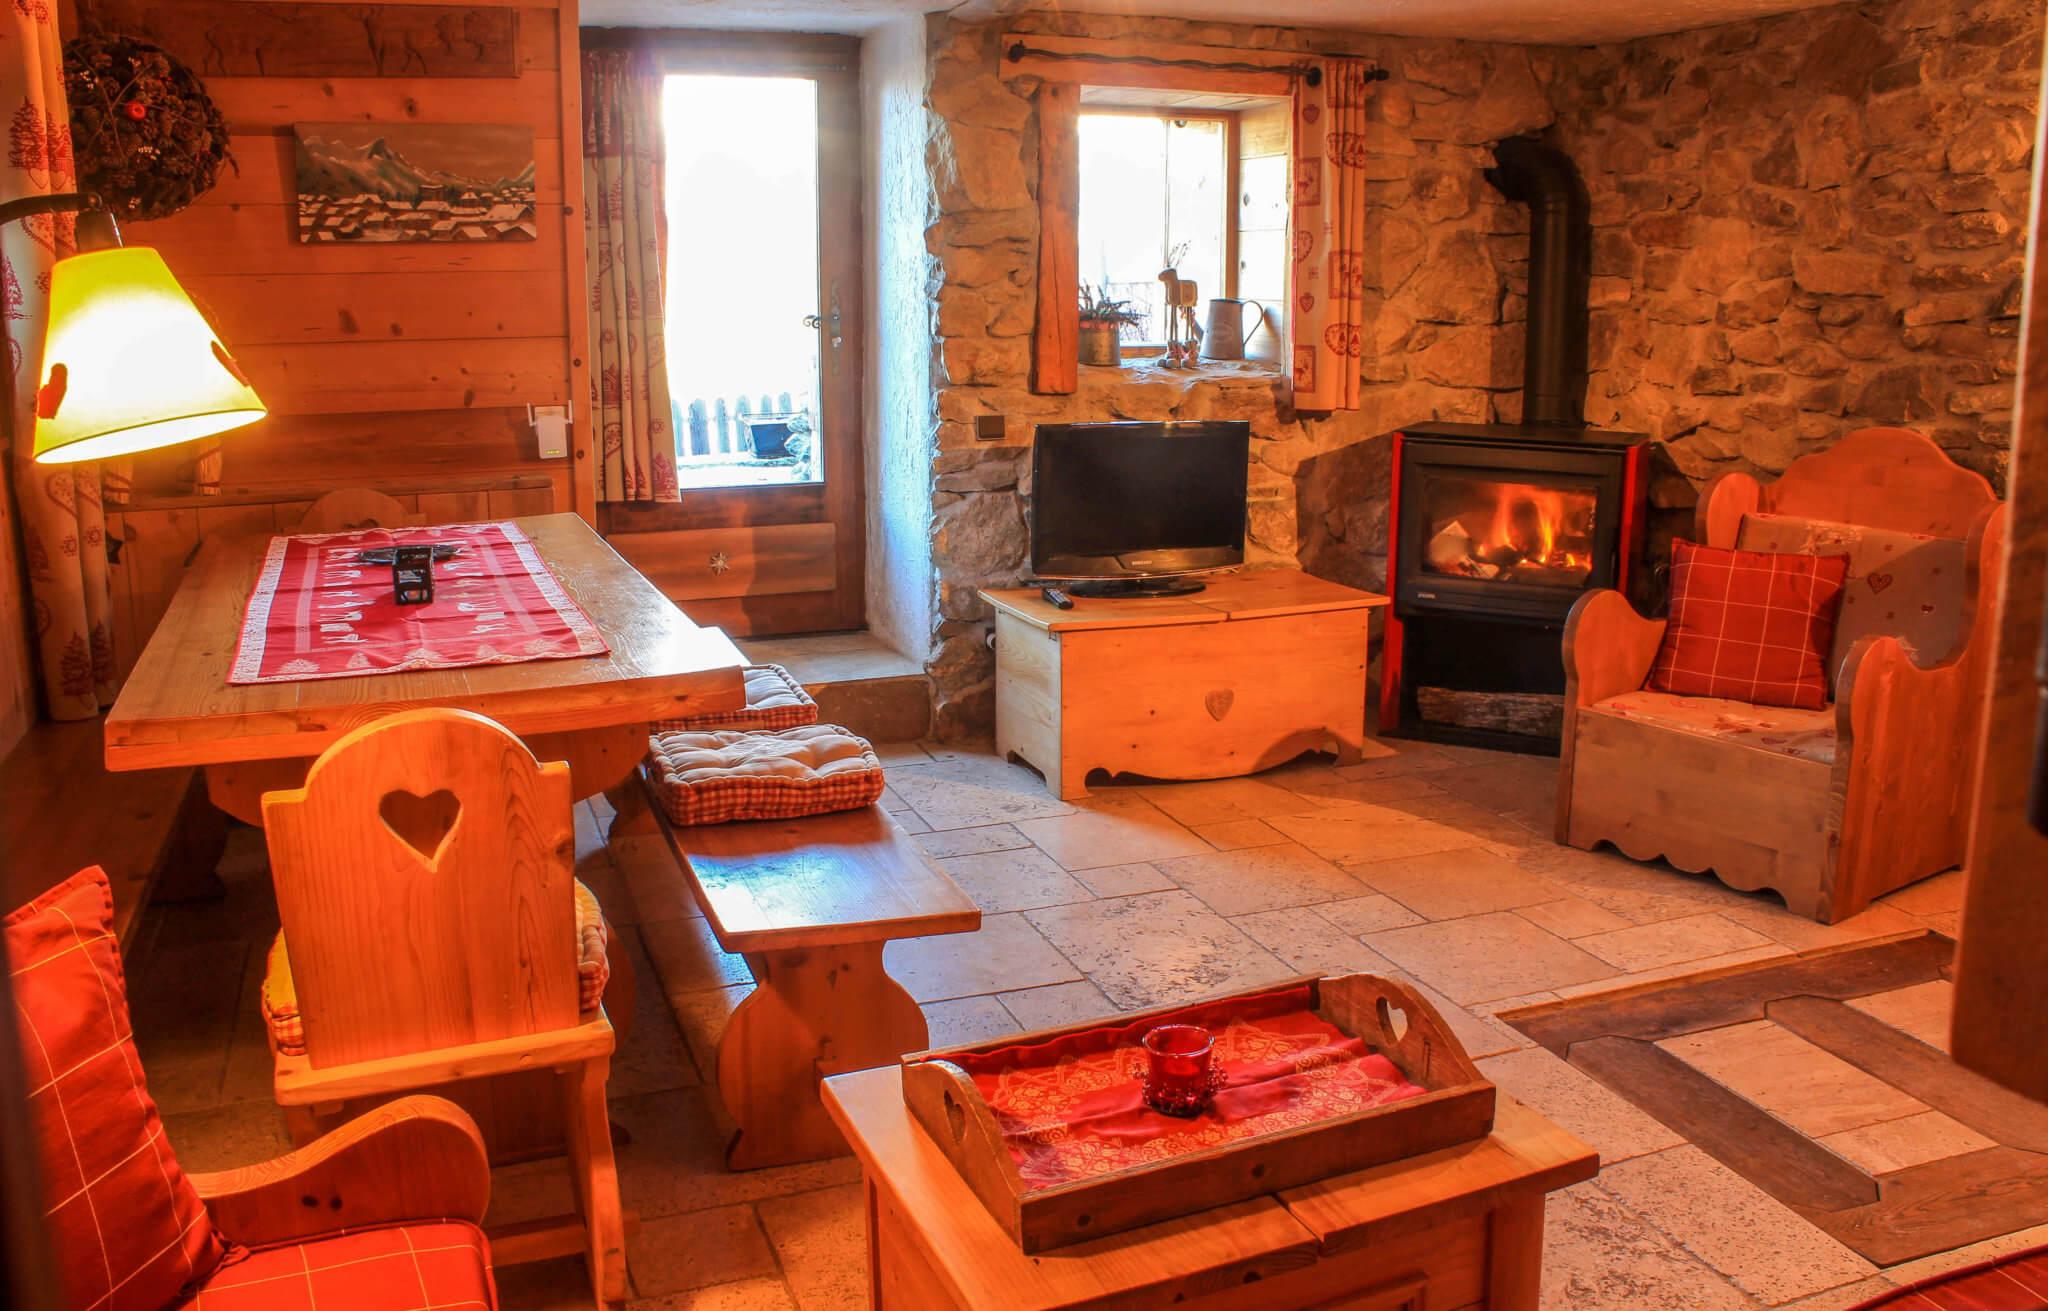 img 9084 1 e1530732051423 - Chalet Mont d'Arbois